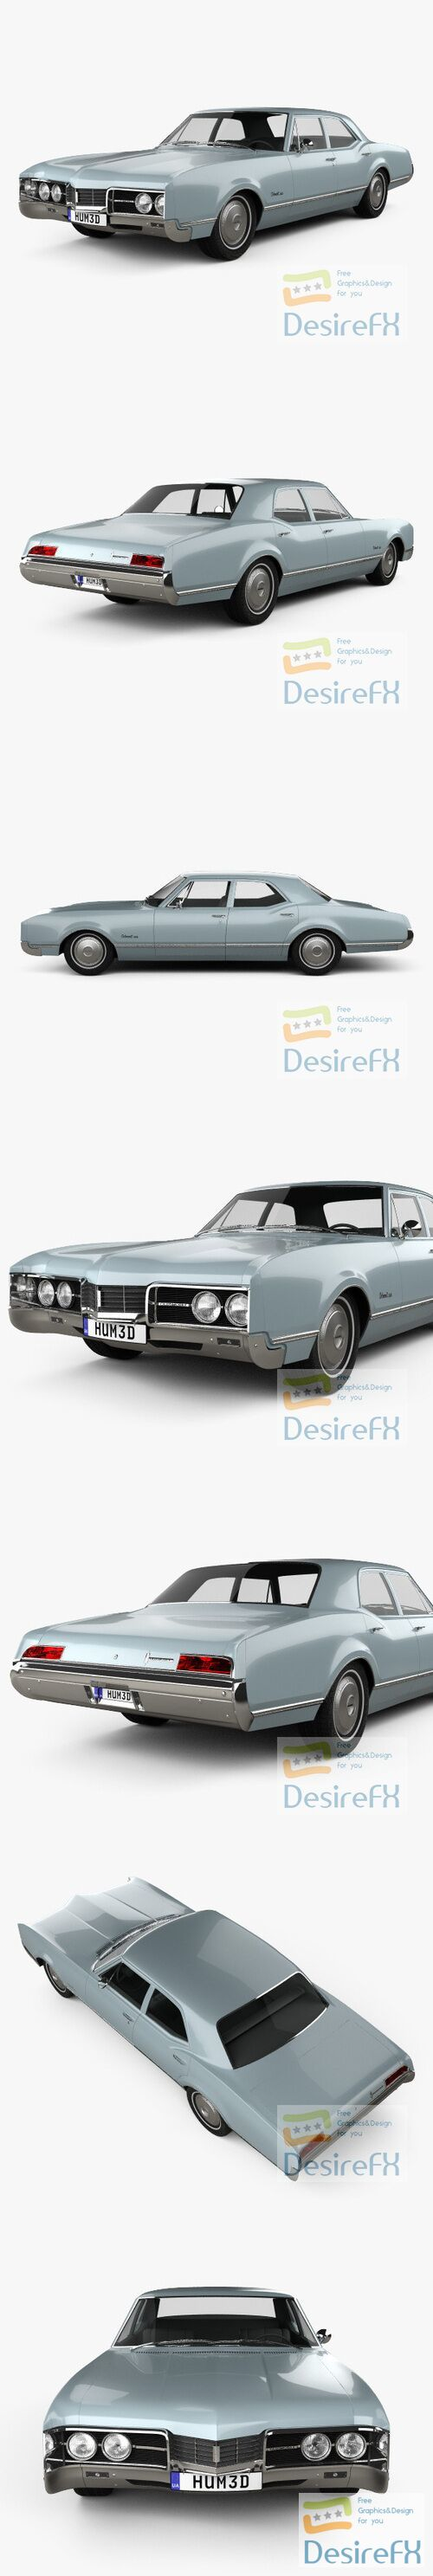 Oldsmobile 88 Delmont sedan 1967 3D Model